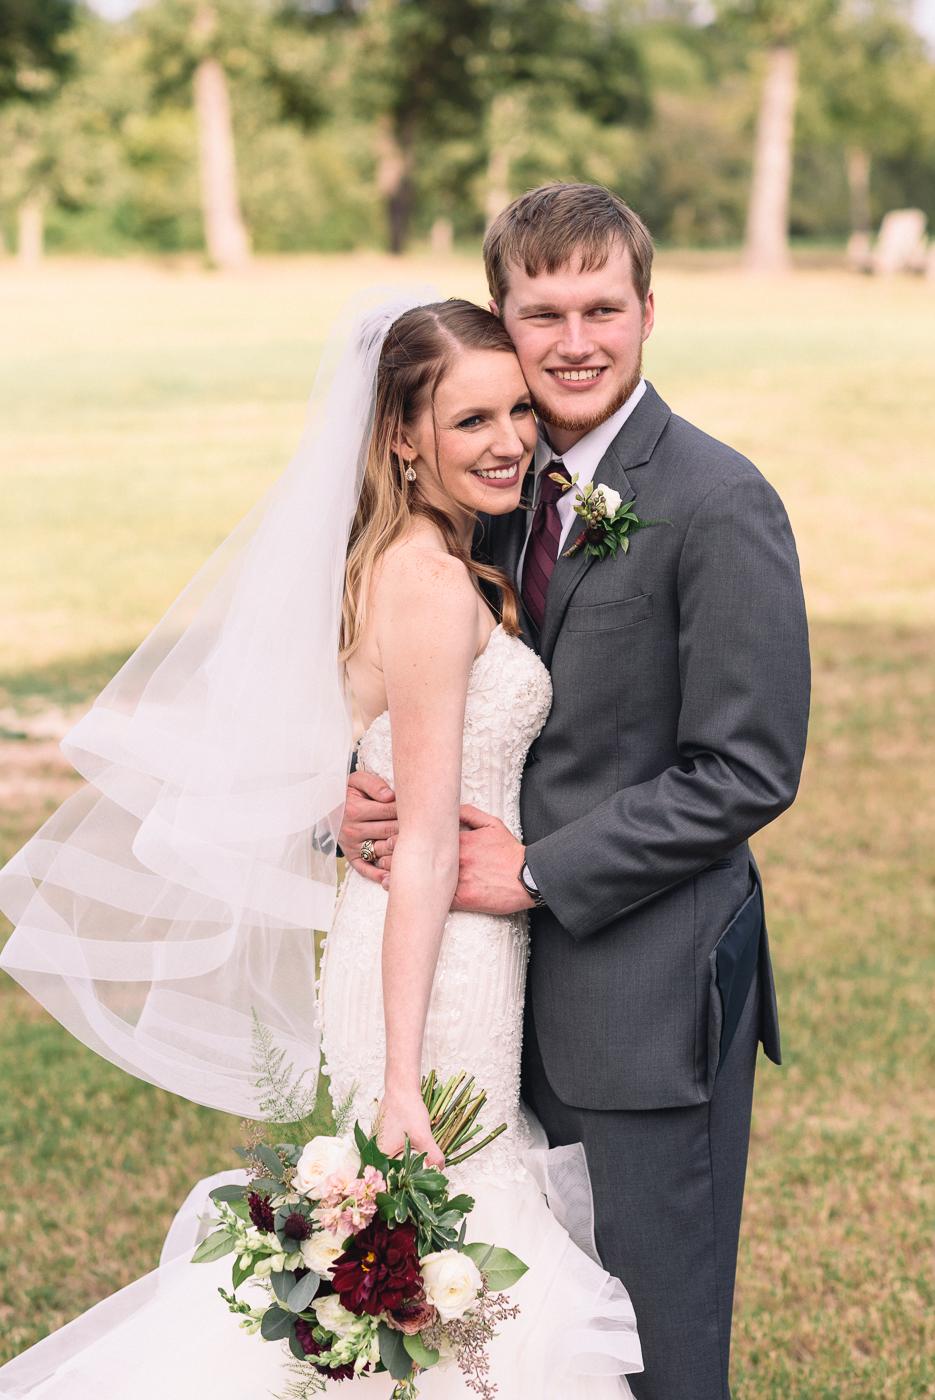 Husband and wife wedding portrait mermaid gown veil